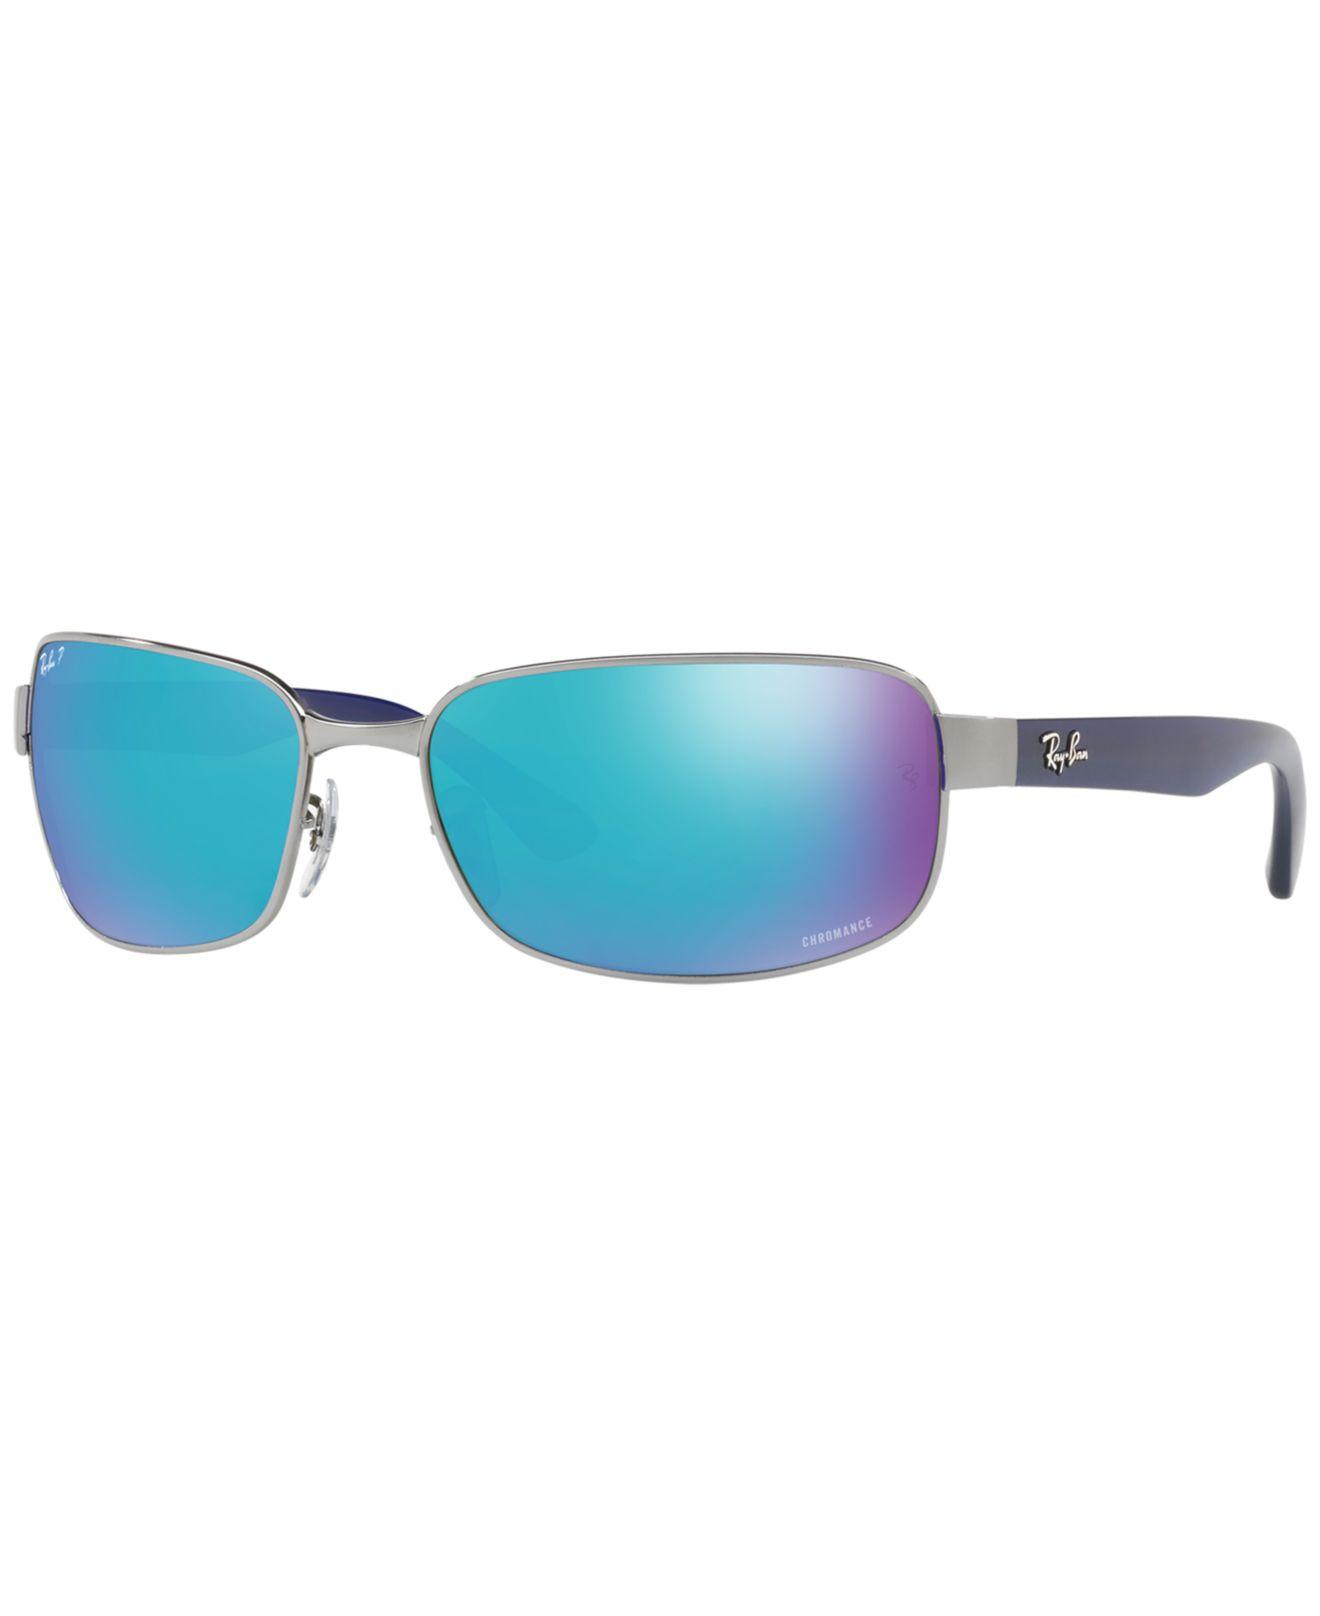 40360e68e97 Ray-Ban. Men s Blue Polarized Sunglasses